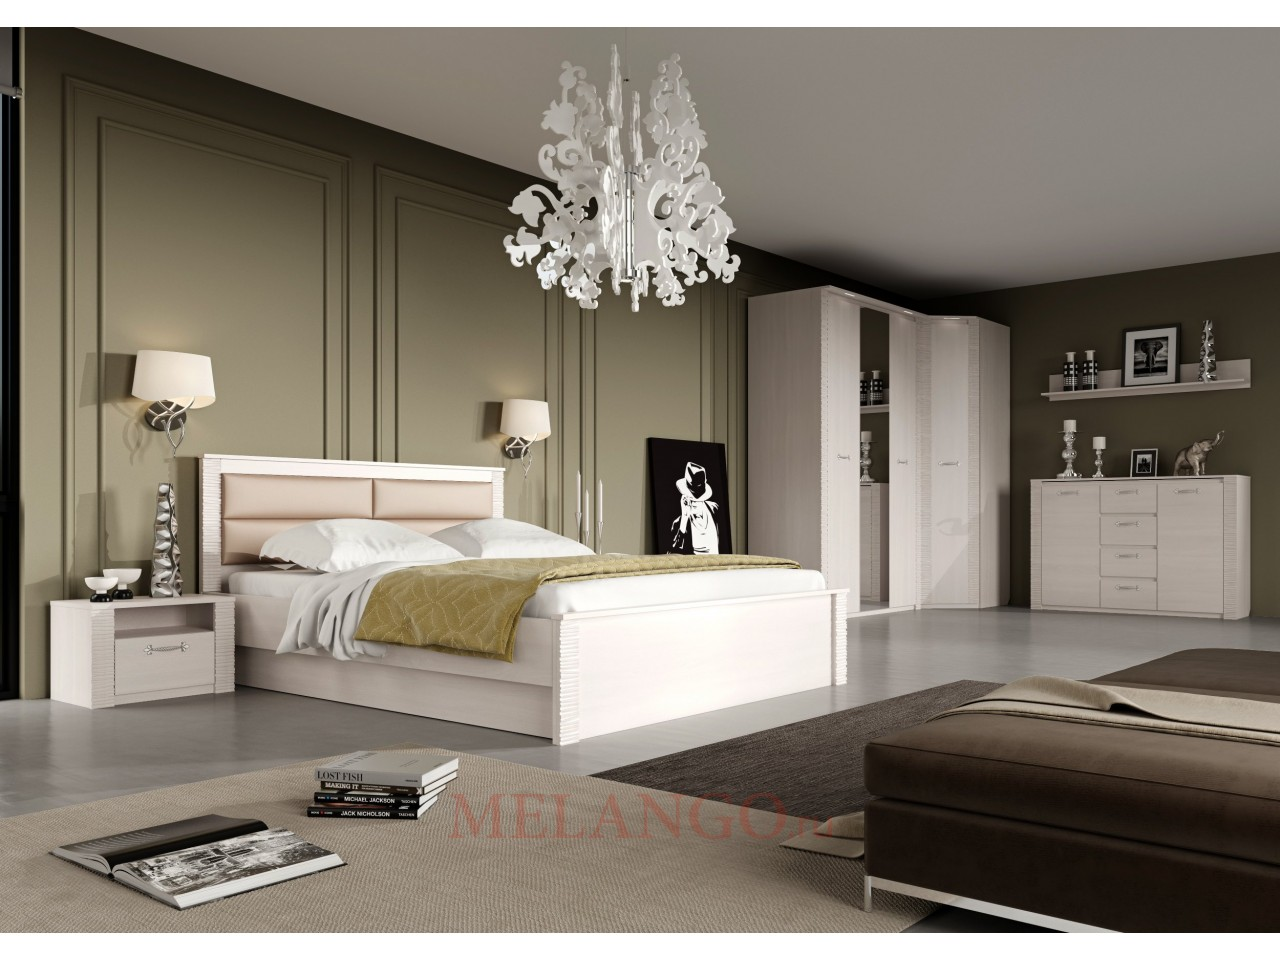 Спальня Элана от МебельГрад, цвет Бодега белая